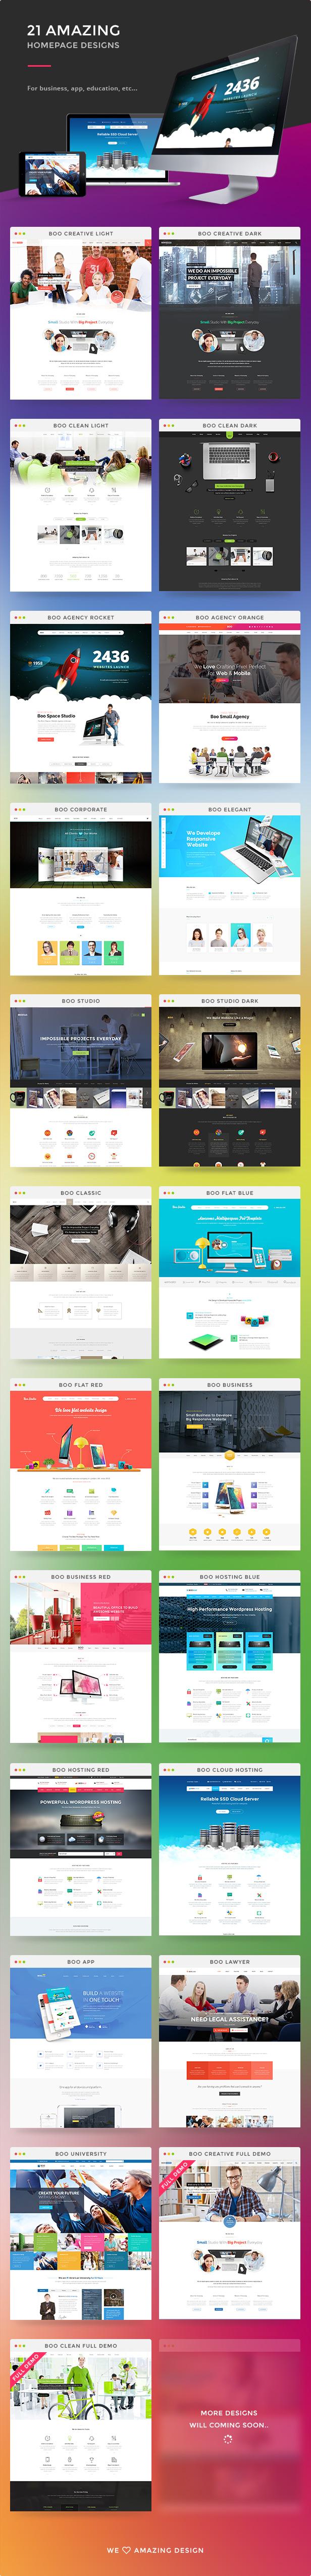 21 incredible homepage designs